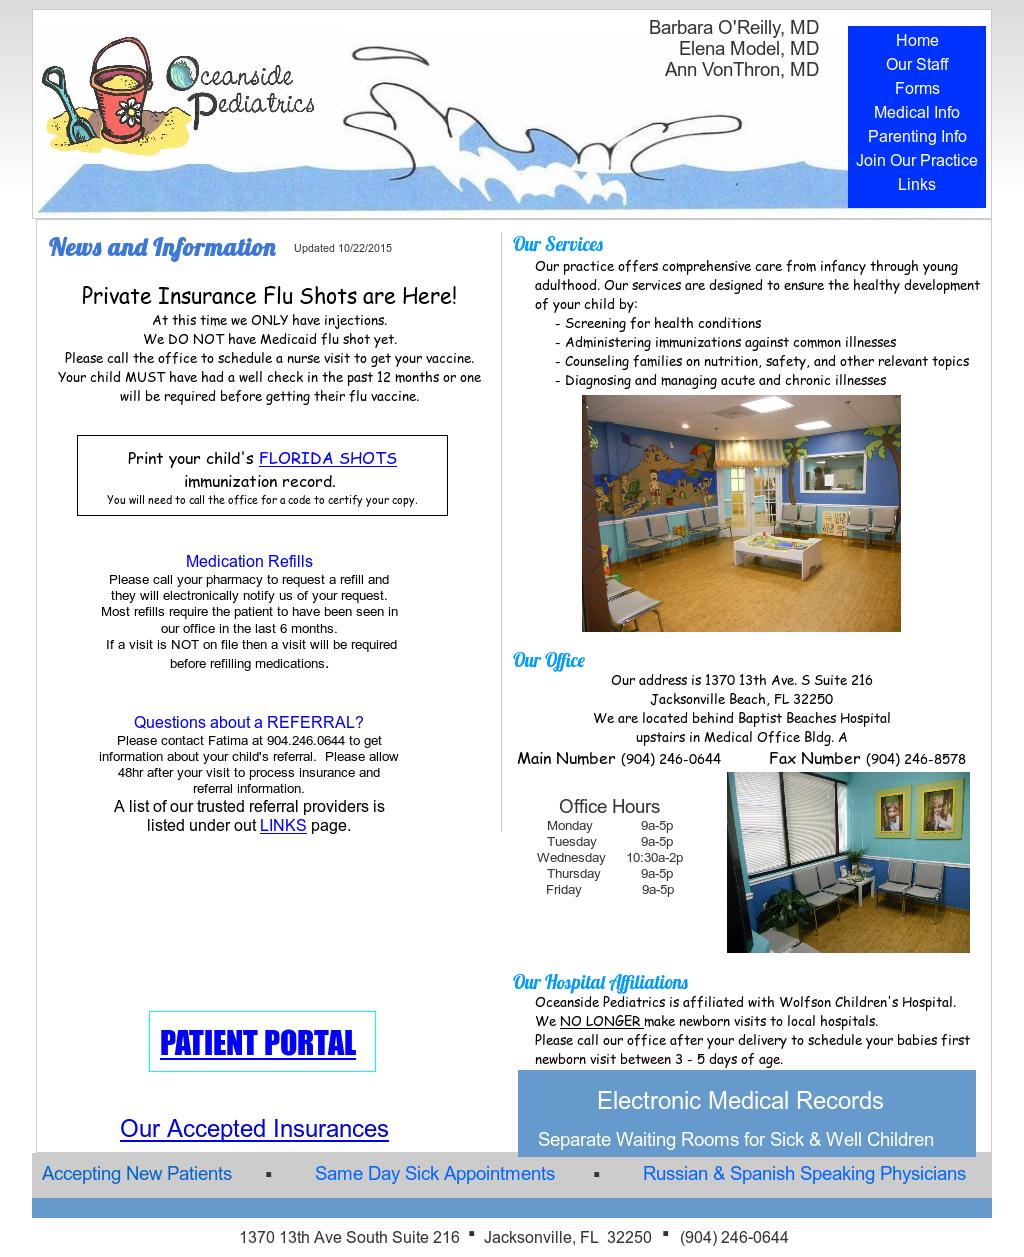 Oceanside Pediatrics Competitors, Revenue and Employees